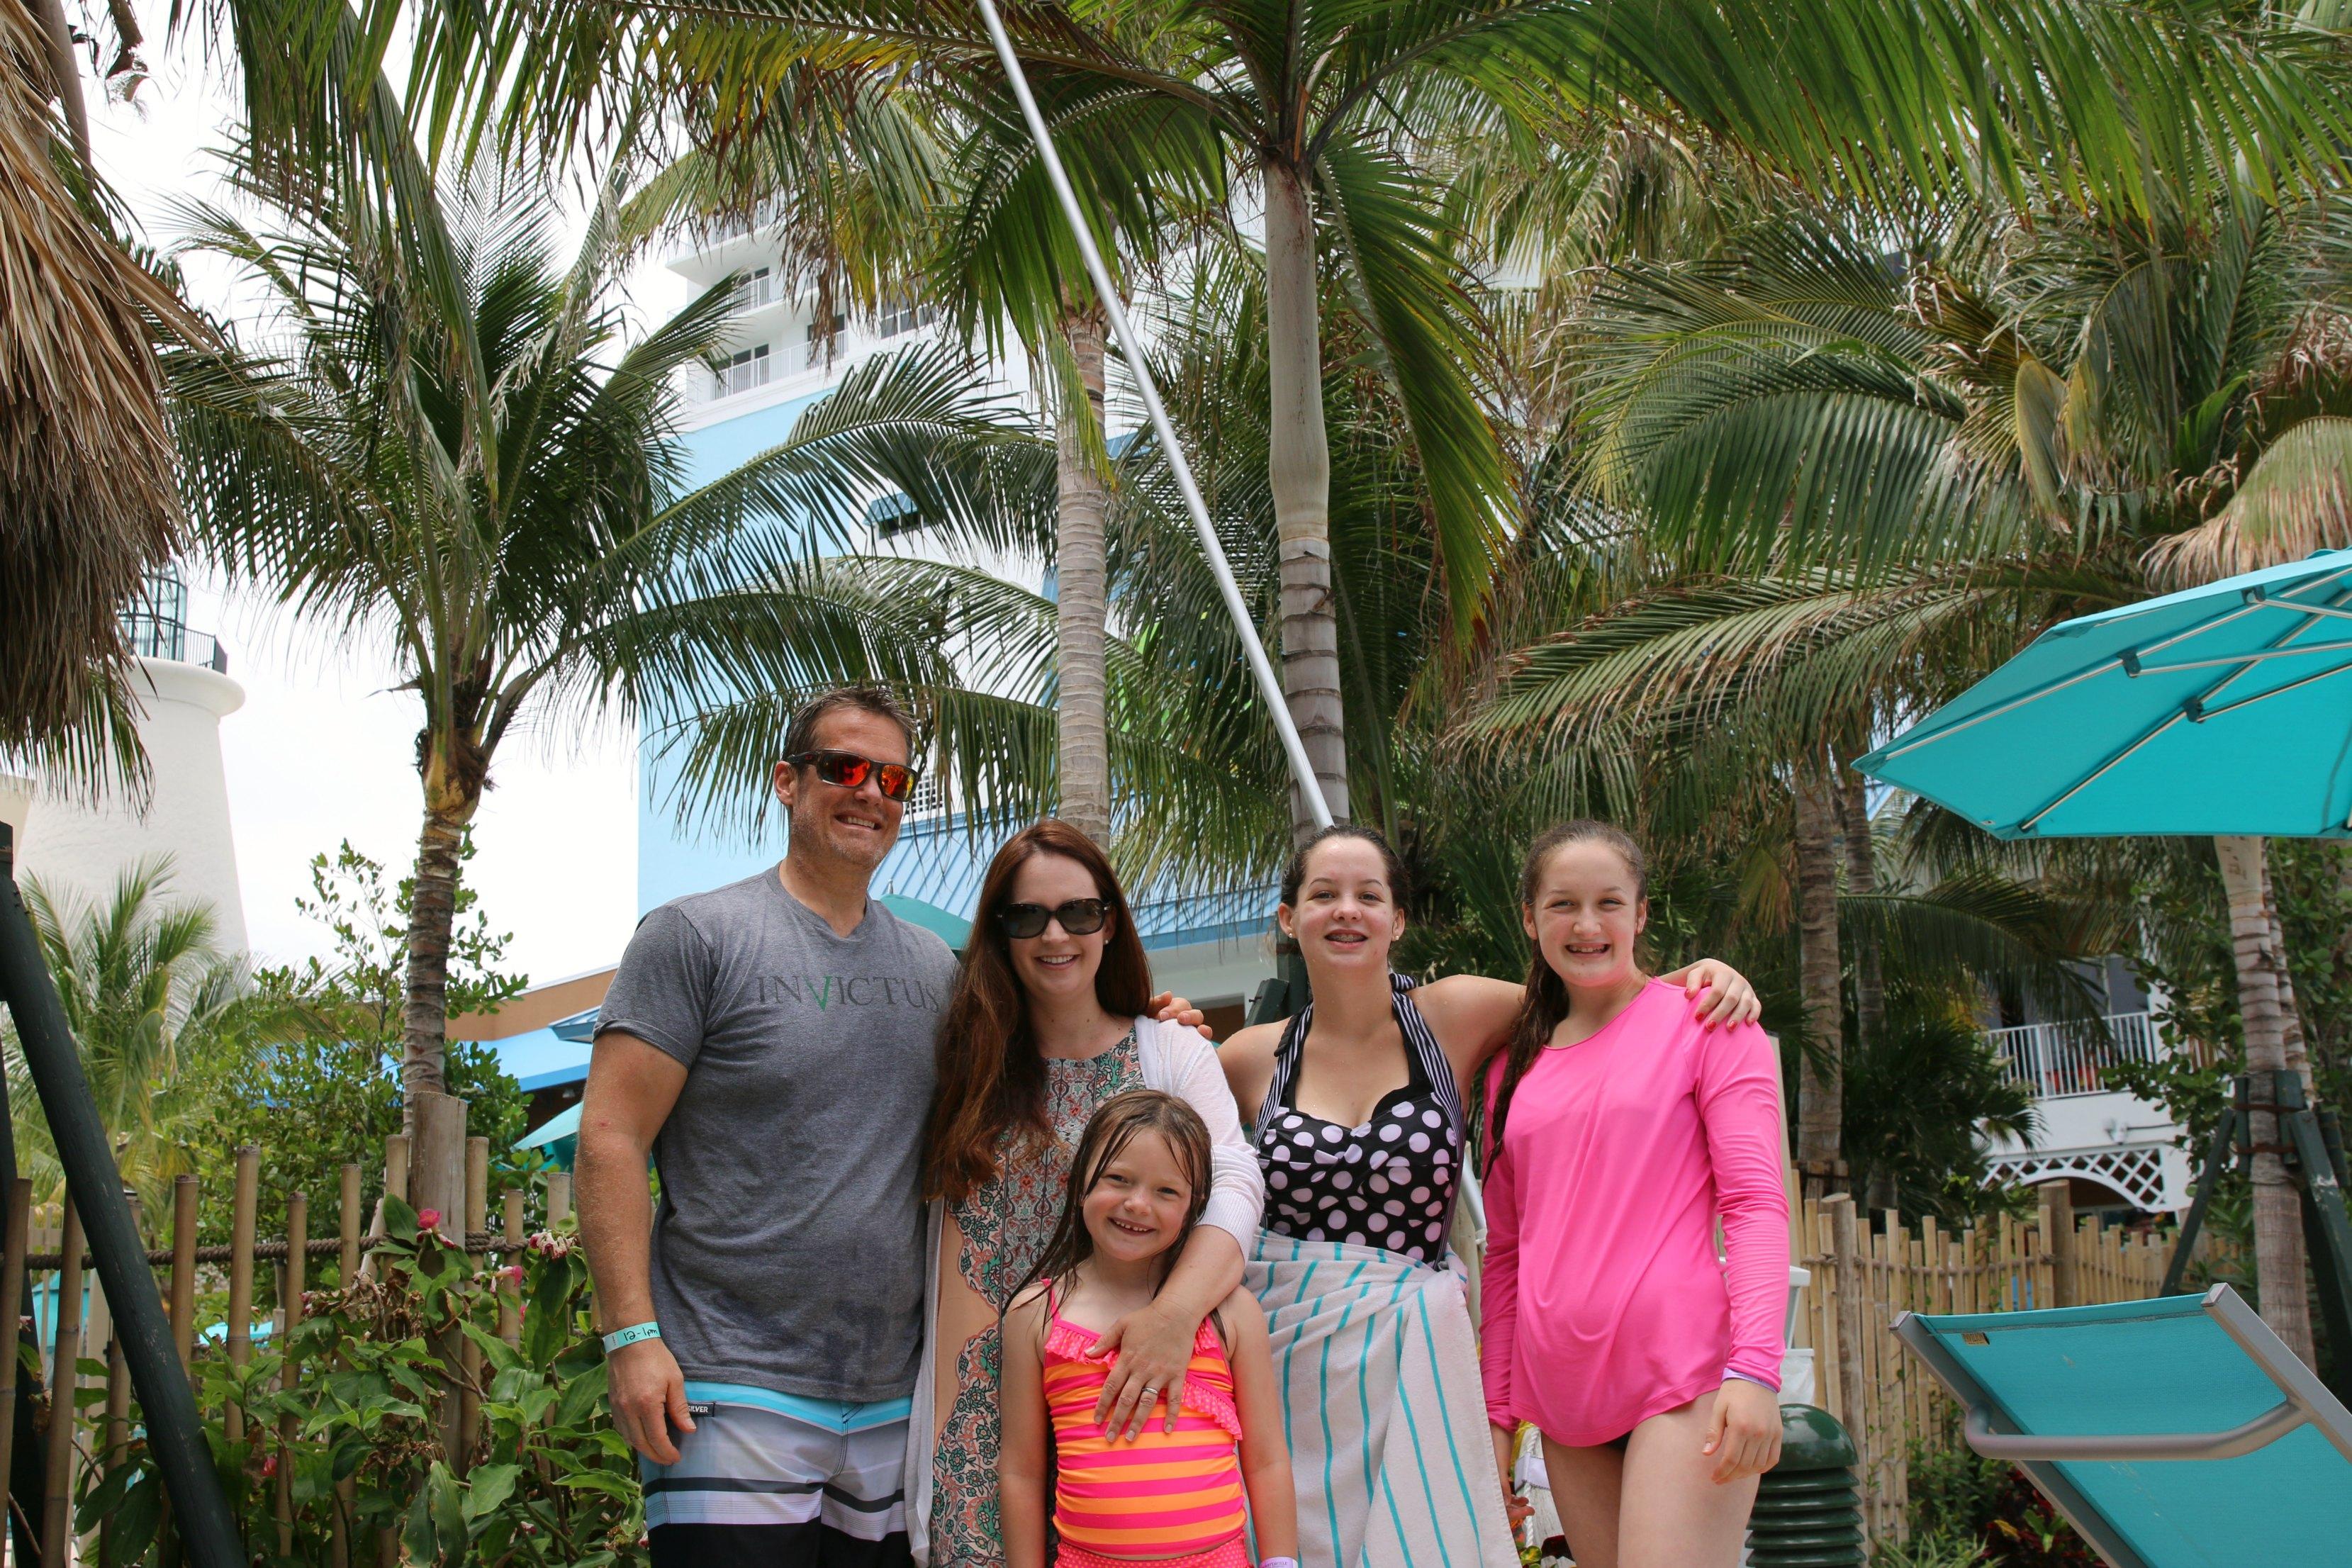 family friendly resort hollywood fl